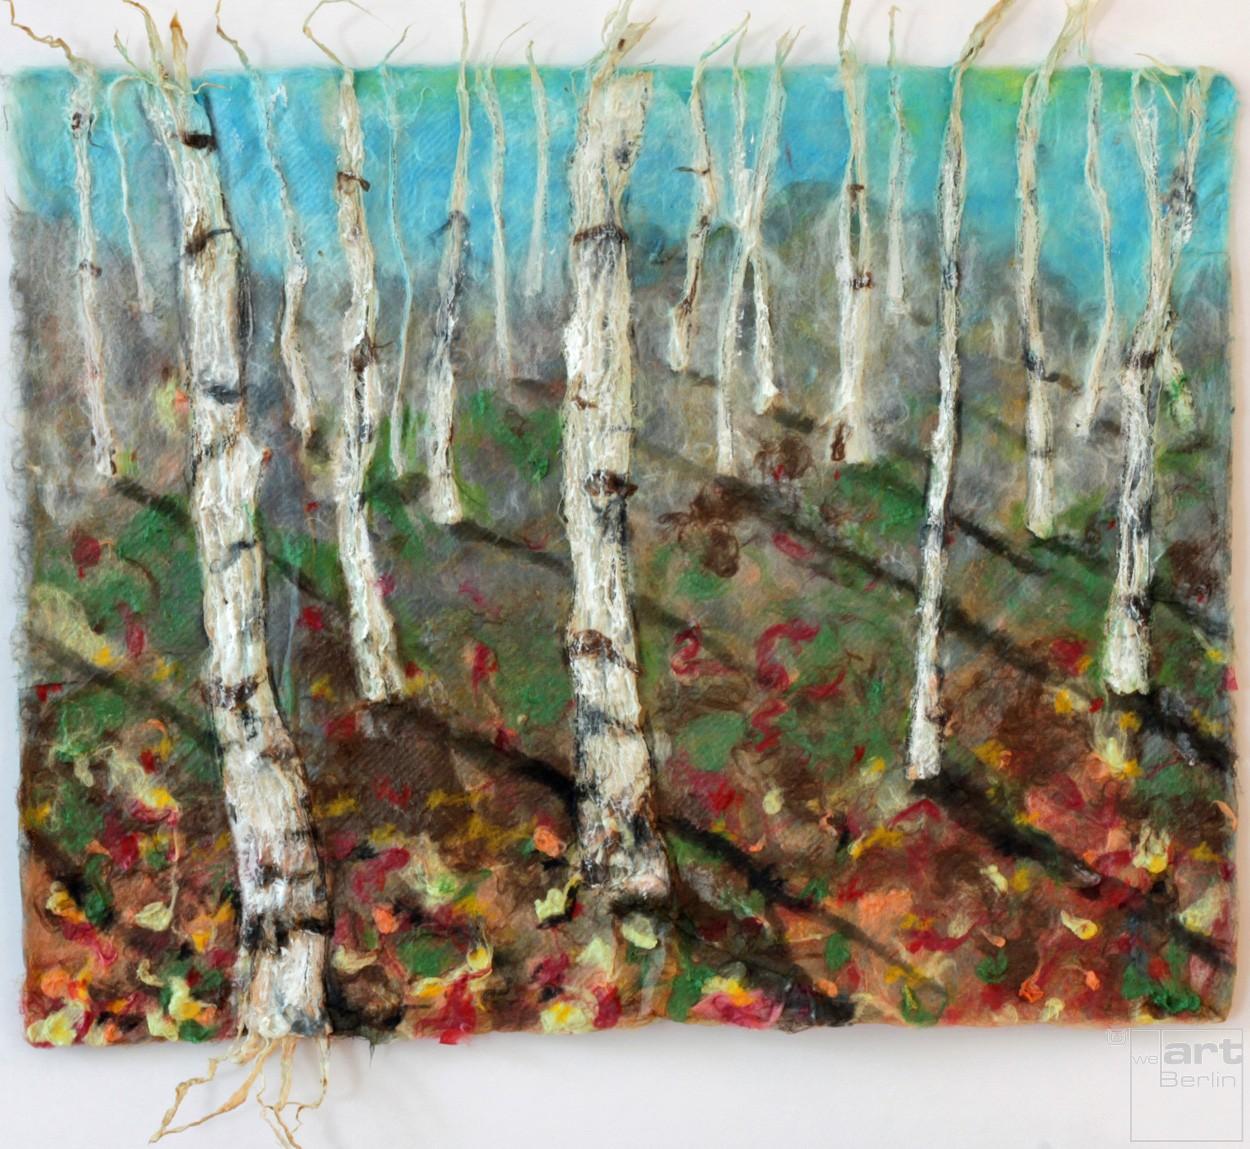 Birkenwald   Malerei von Künstlerin Simone Westphal, Papiermalerei, Acryl